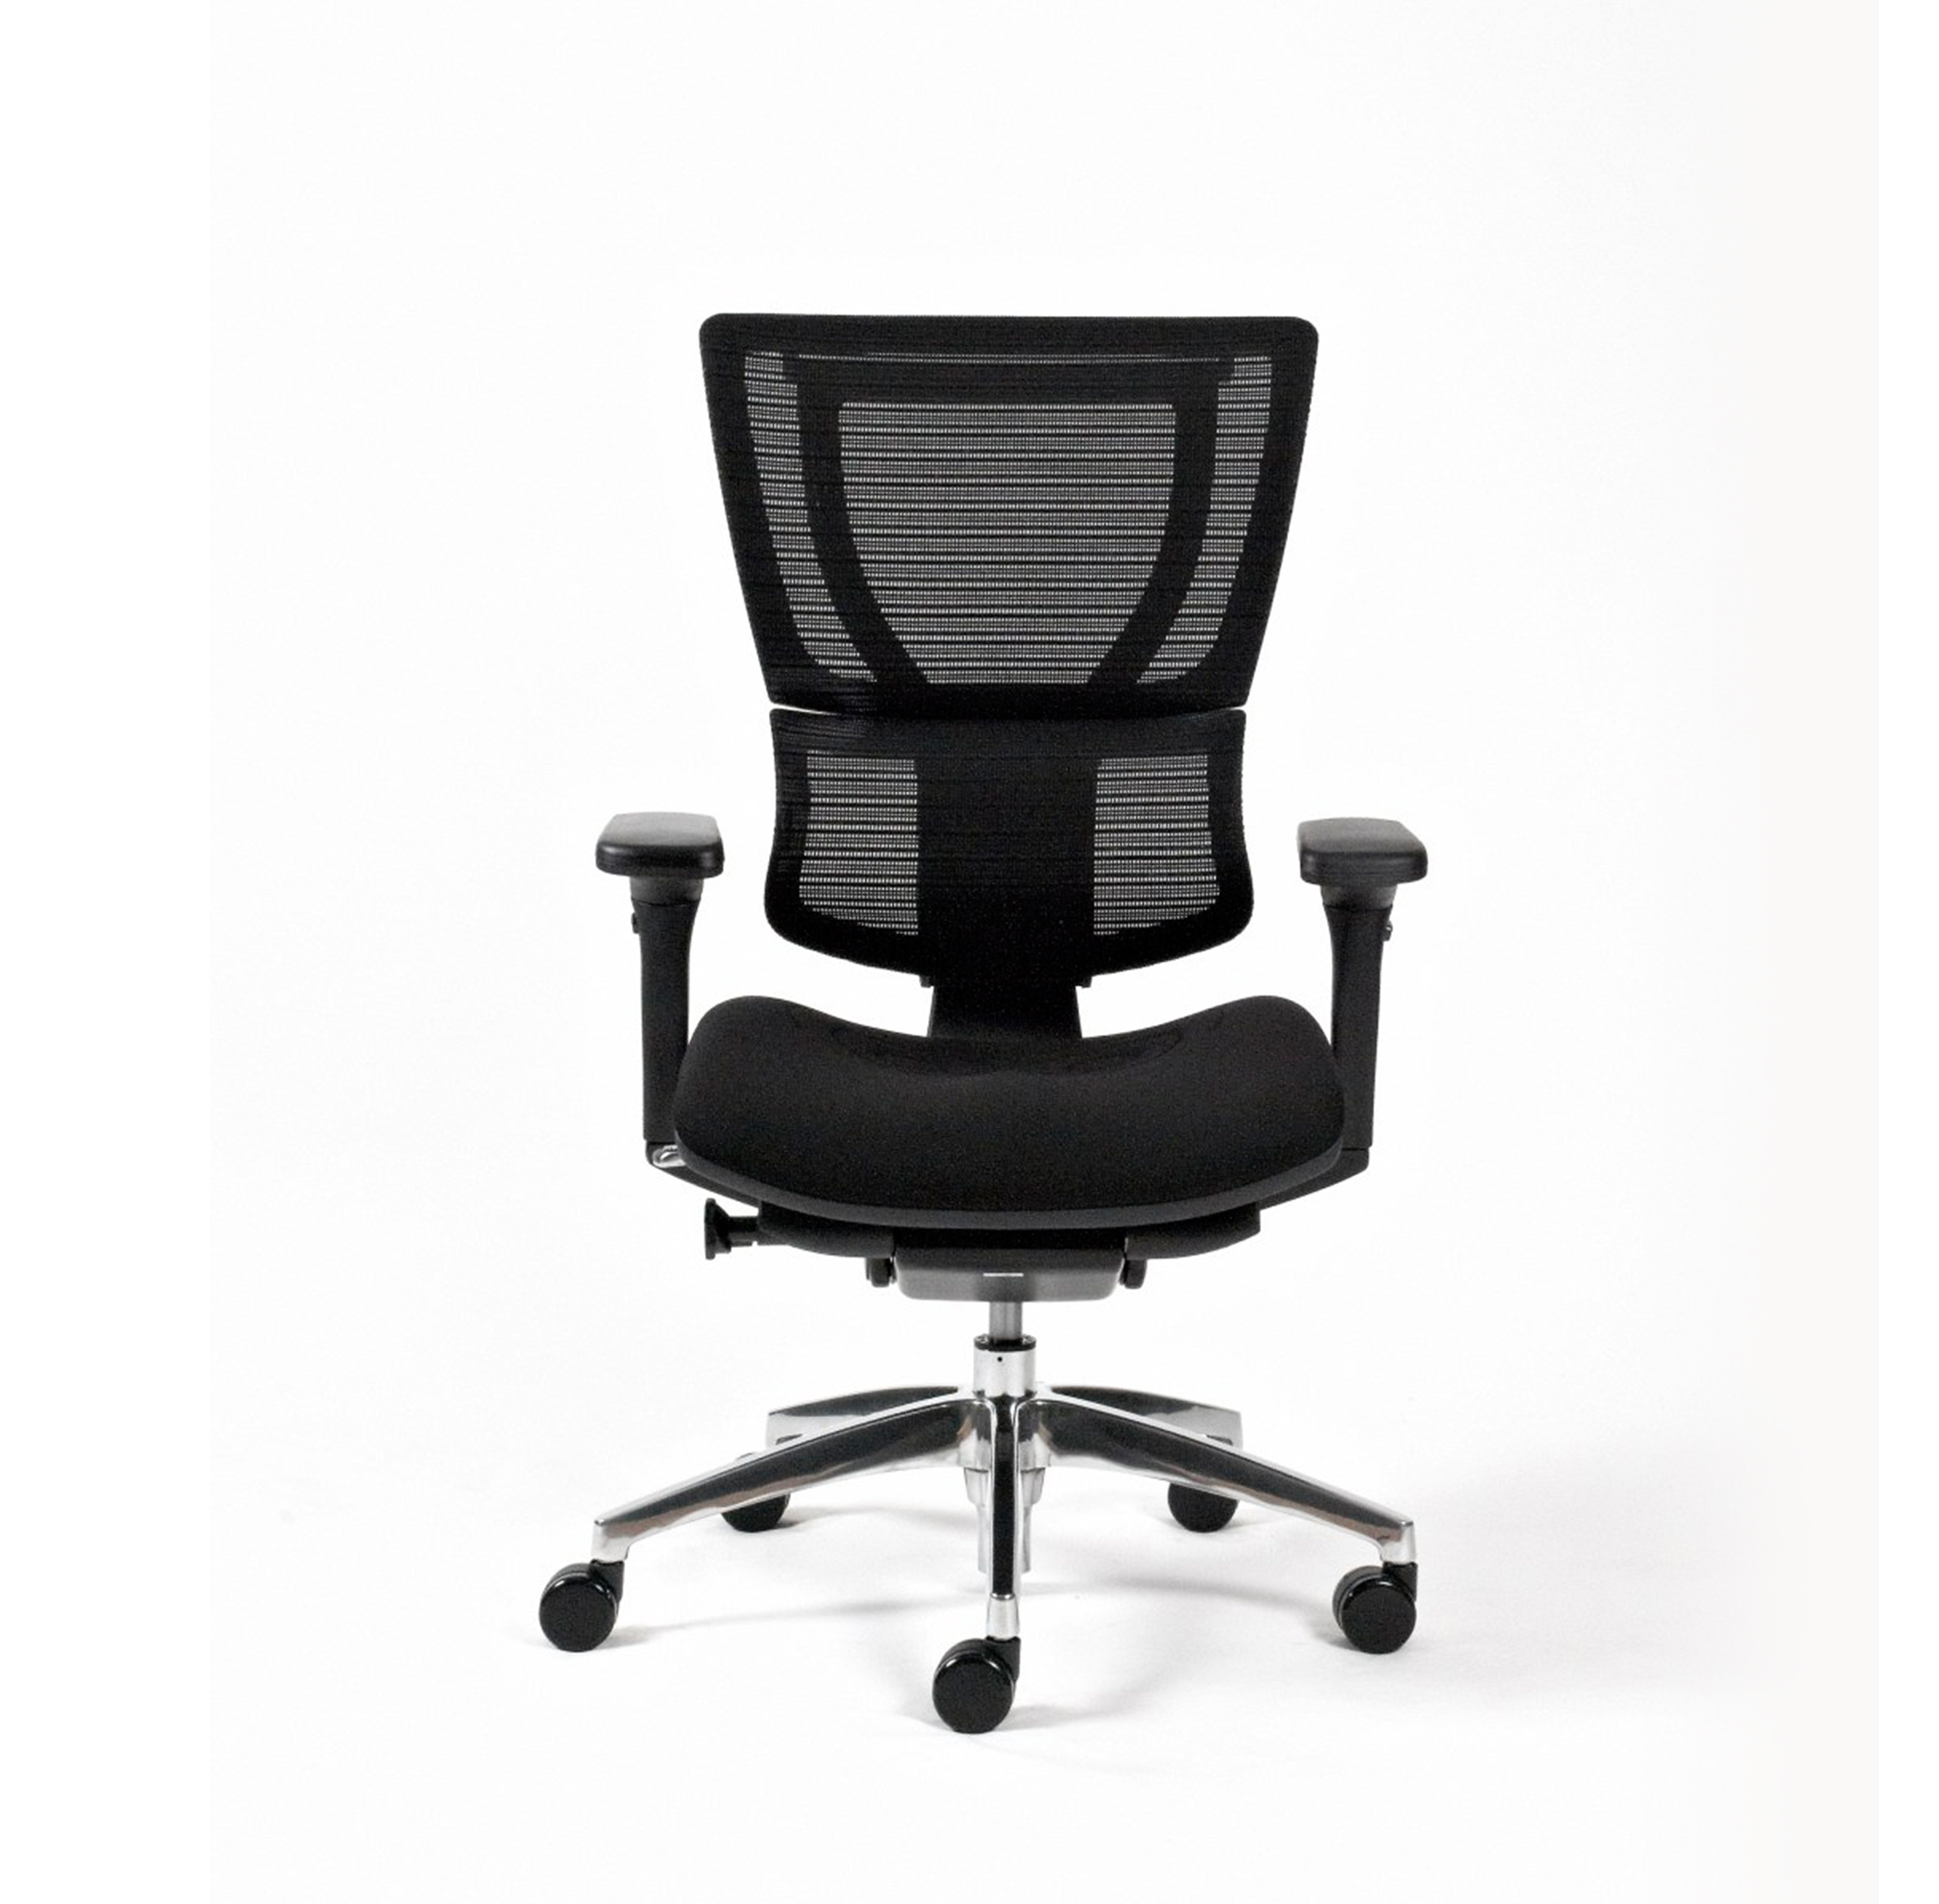 IForm Executive Chair